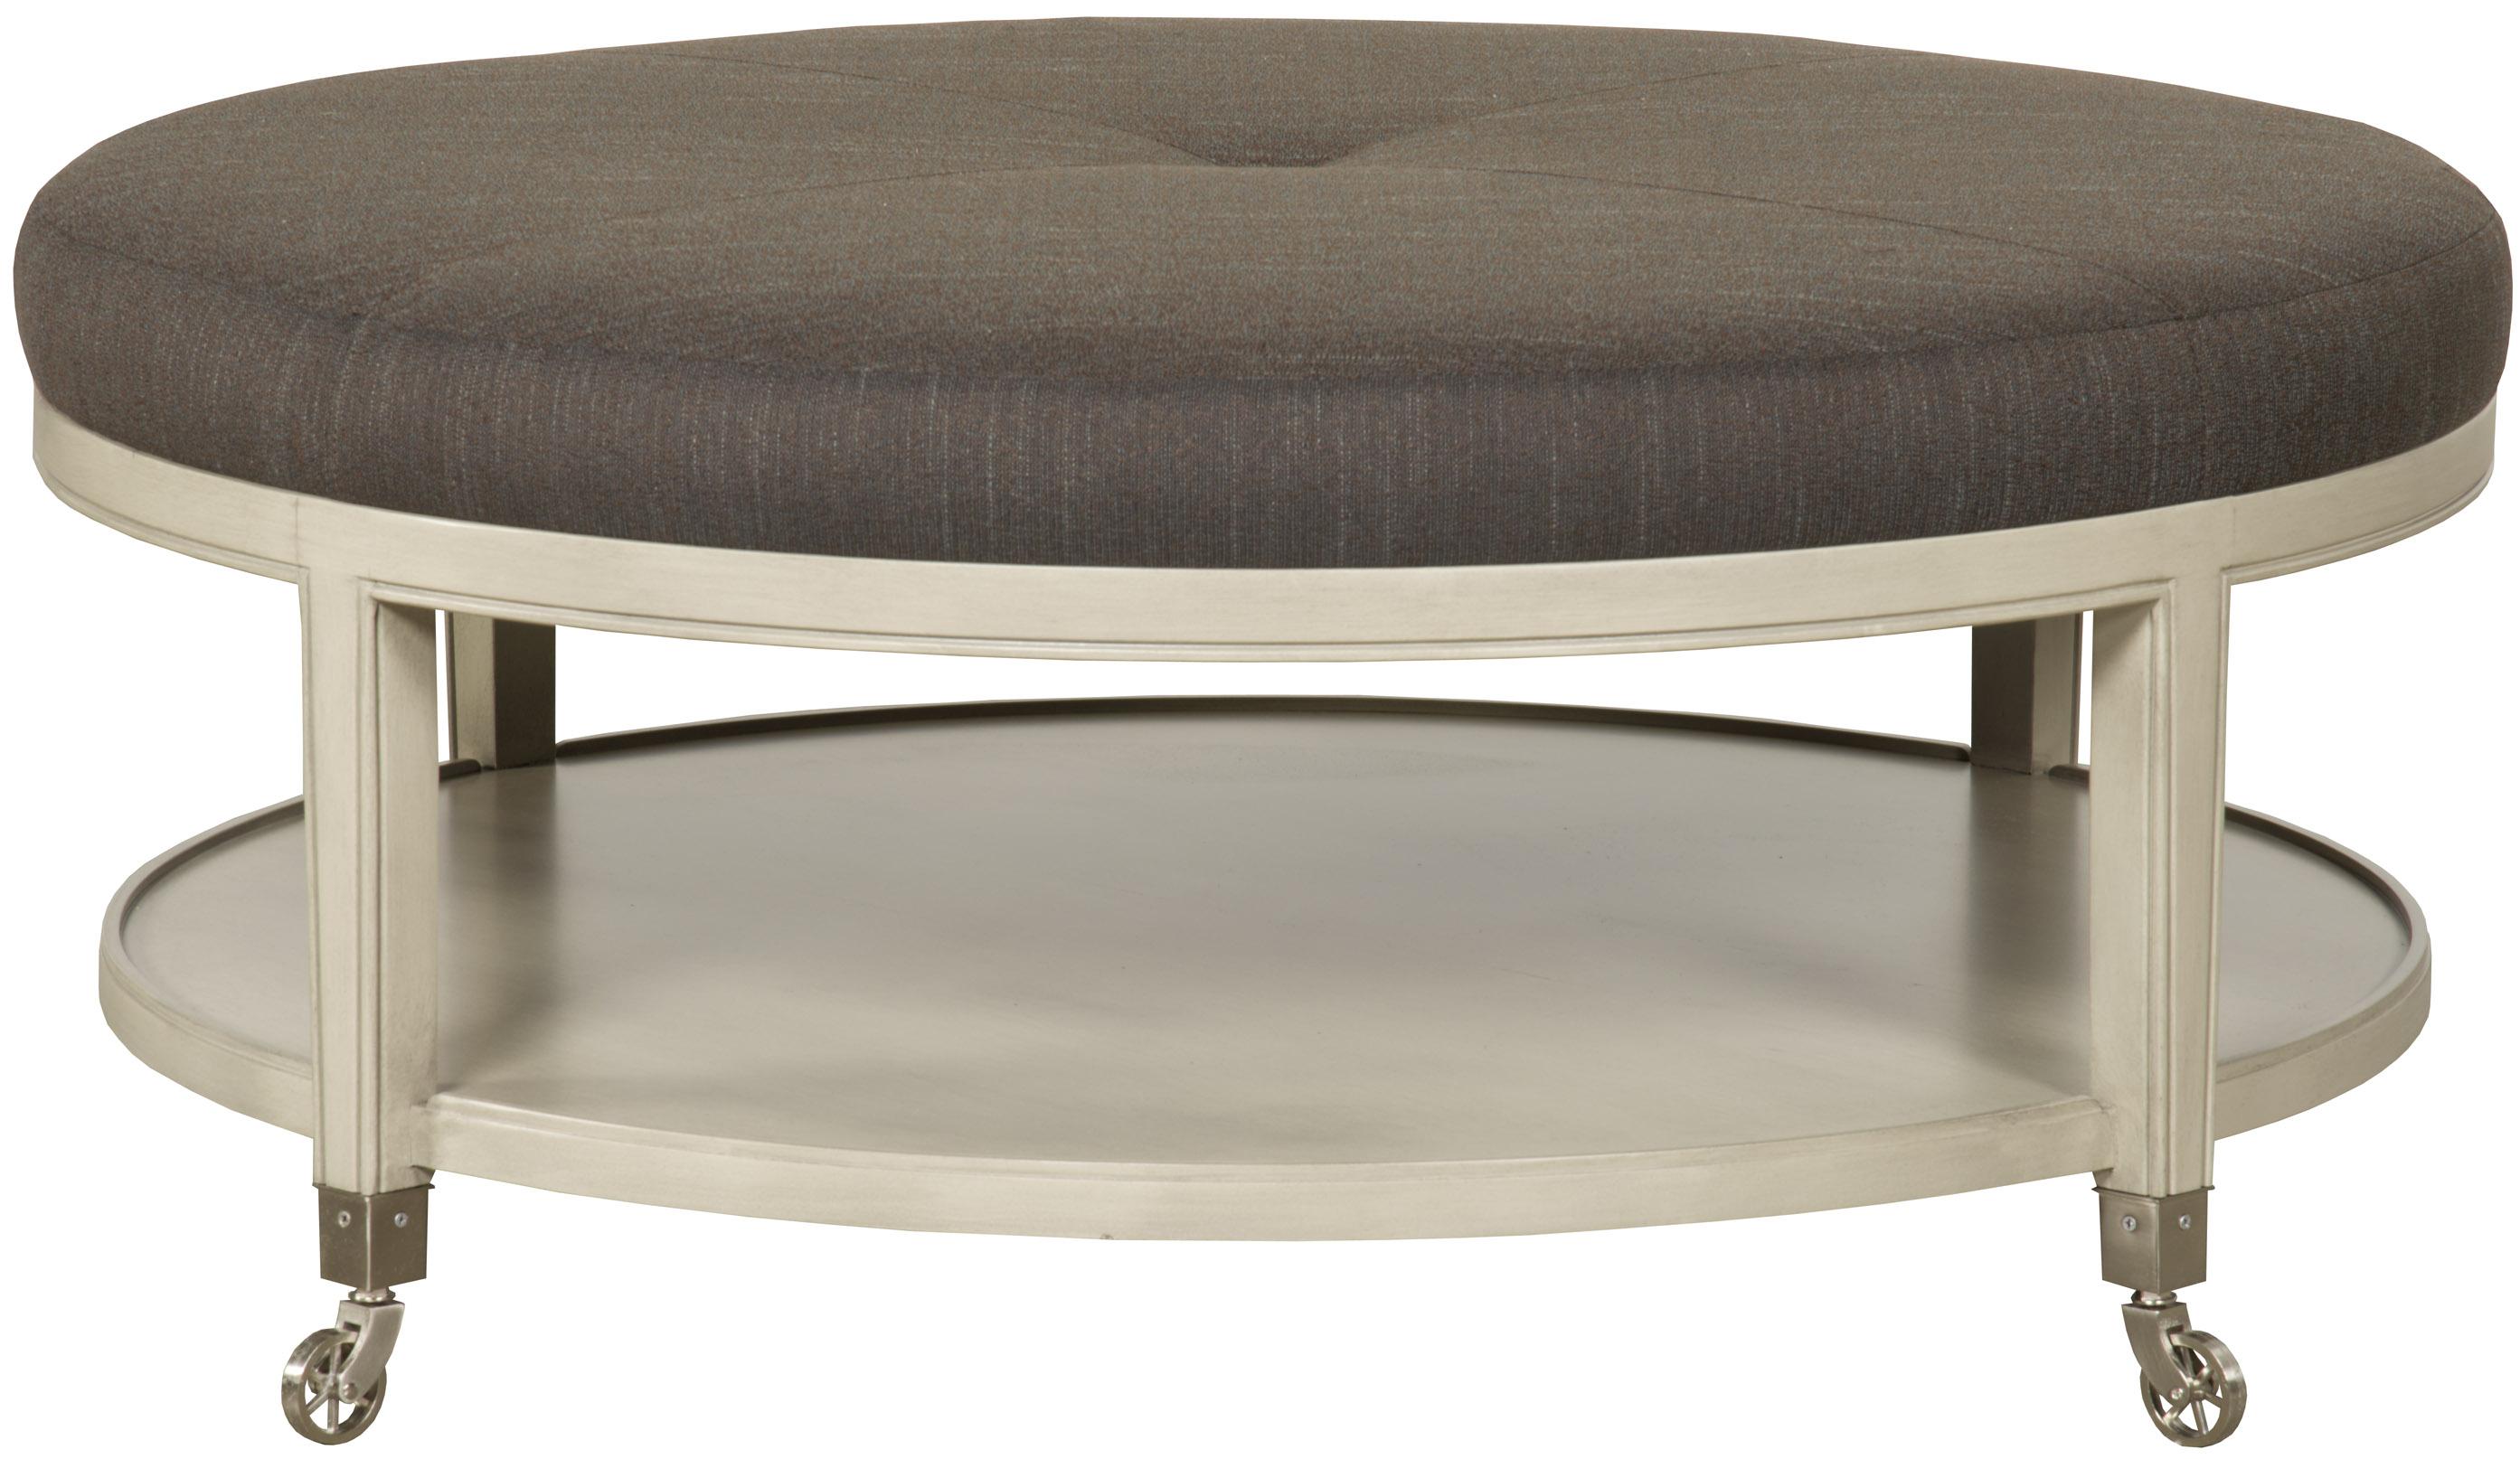 Vanguard Furniture - Our Products - W158C-OT Lorenzo Ottoman